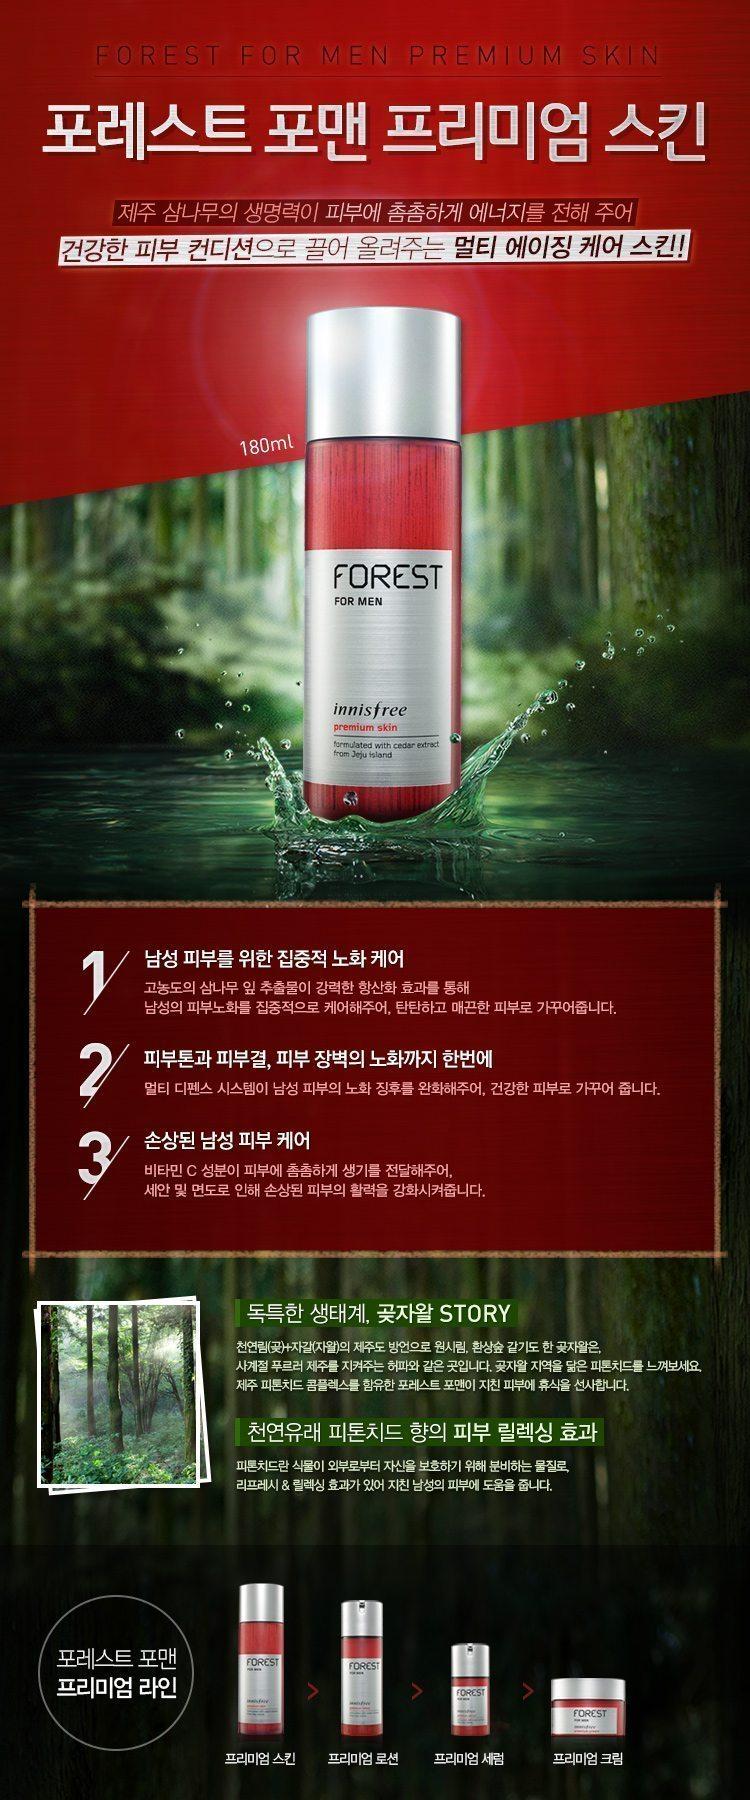 Innisfree Forest For Men Premium Skin Price Malaysia Greece Italy Denmark Belgium1